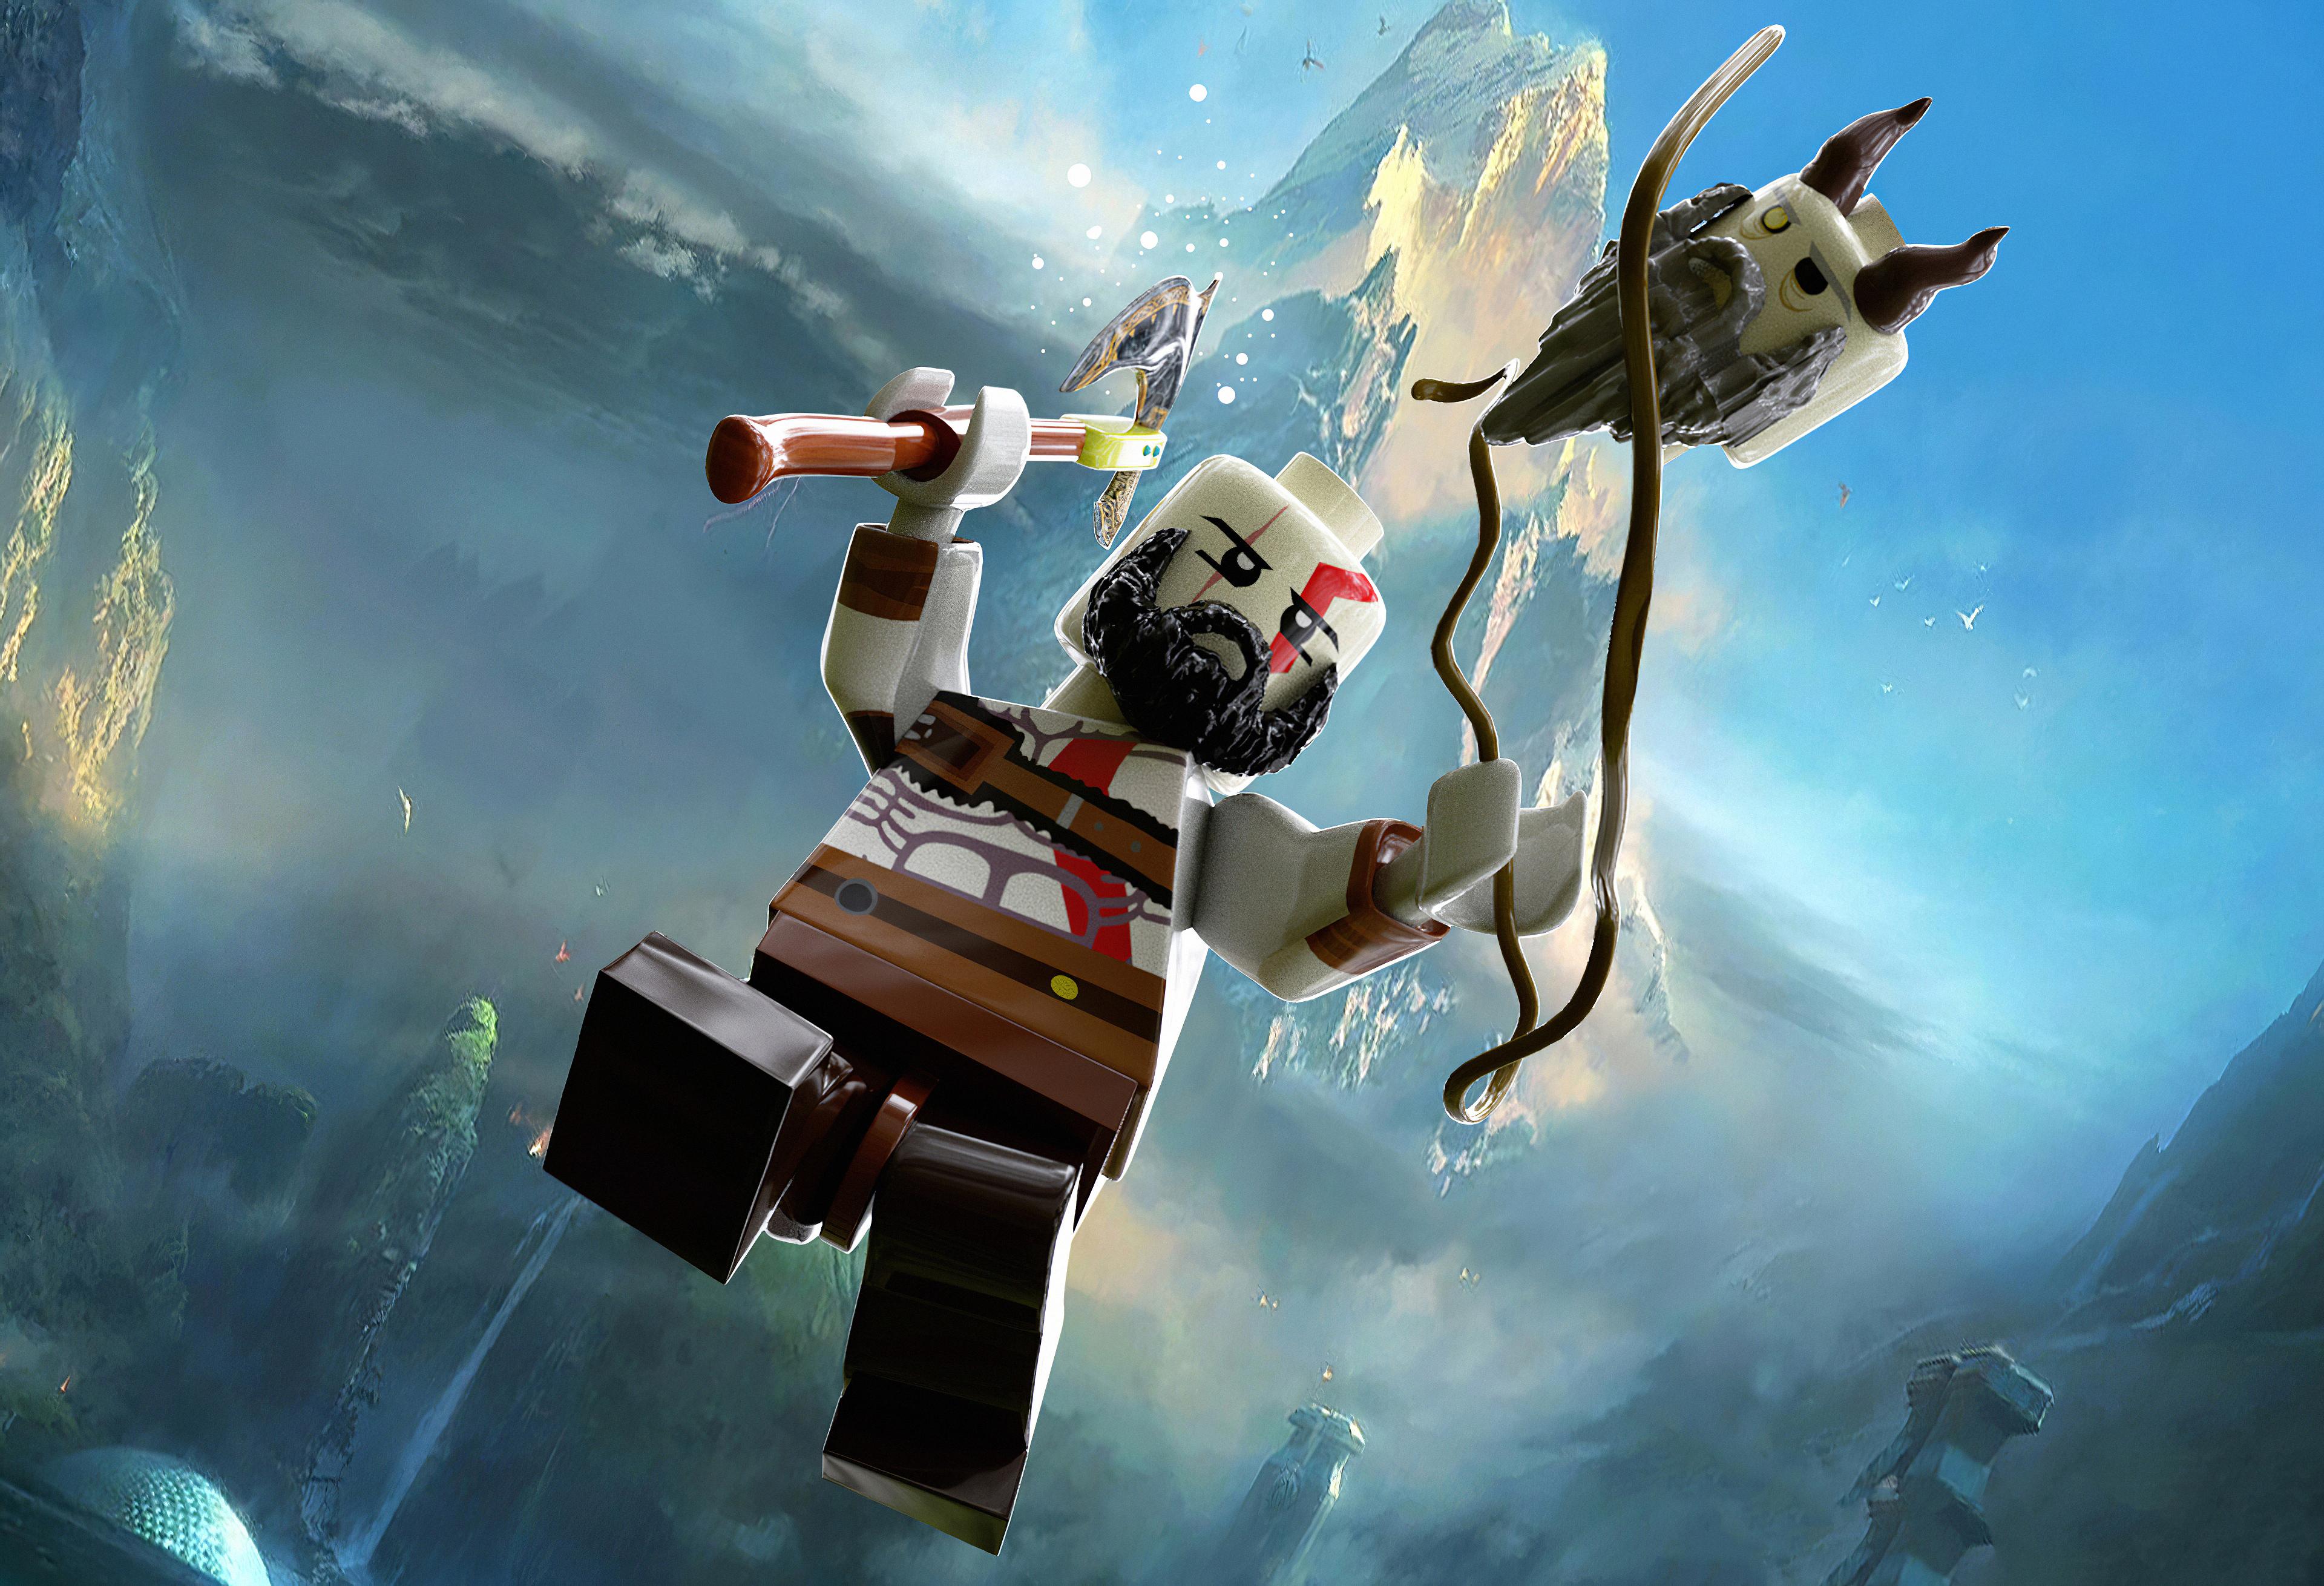 god of war kratos lego art 1578852148 - God Of War Kratos Lego Art - God Of War Kratos Lego Art 4k wallpaper